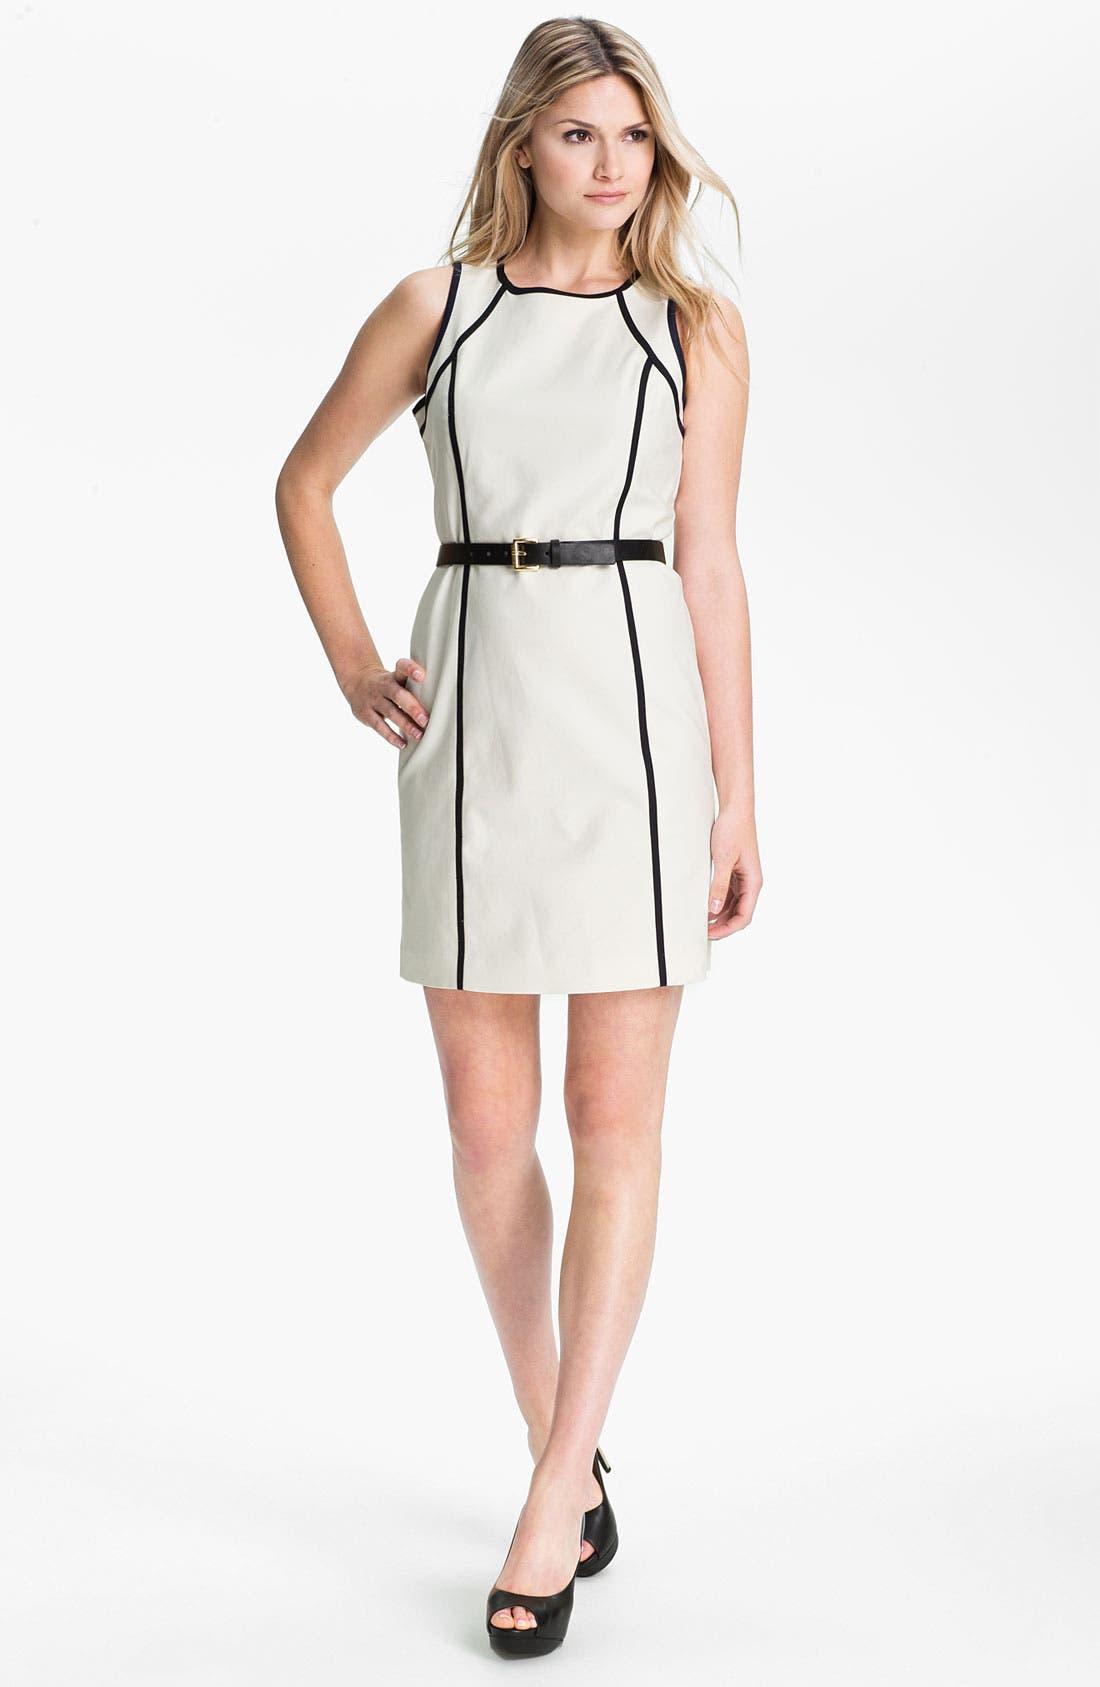 Alternate Image 1 Selected - MICHAEL Michael Kors Sleeveless Scuba Dress (Petite)